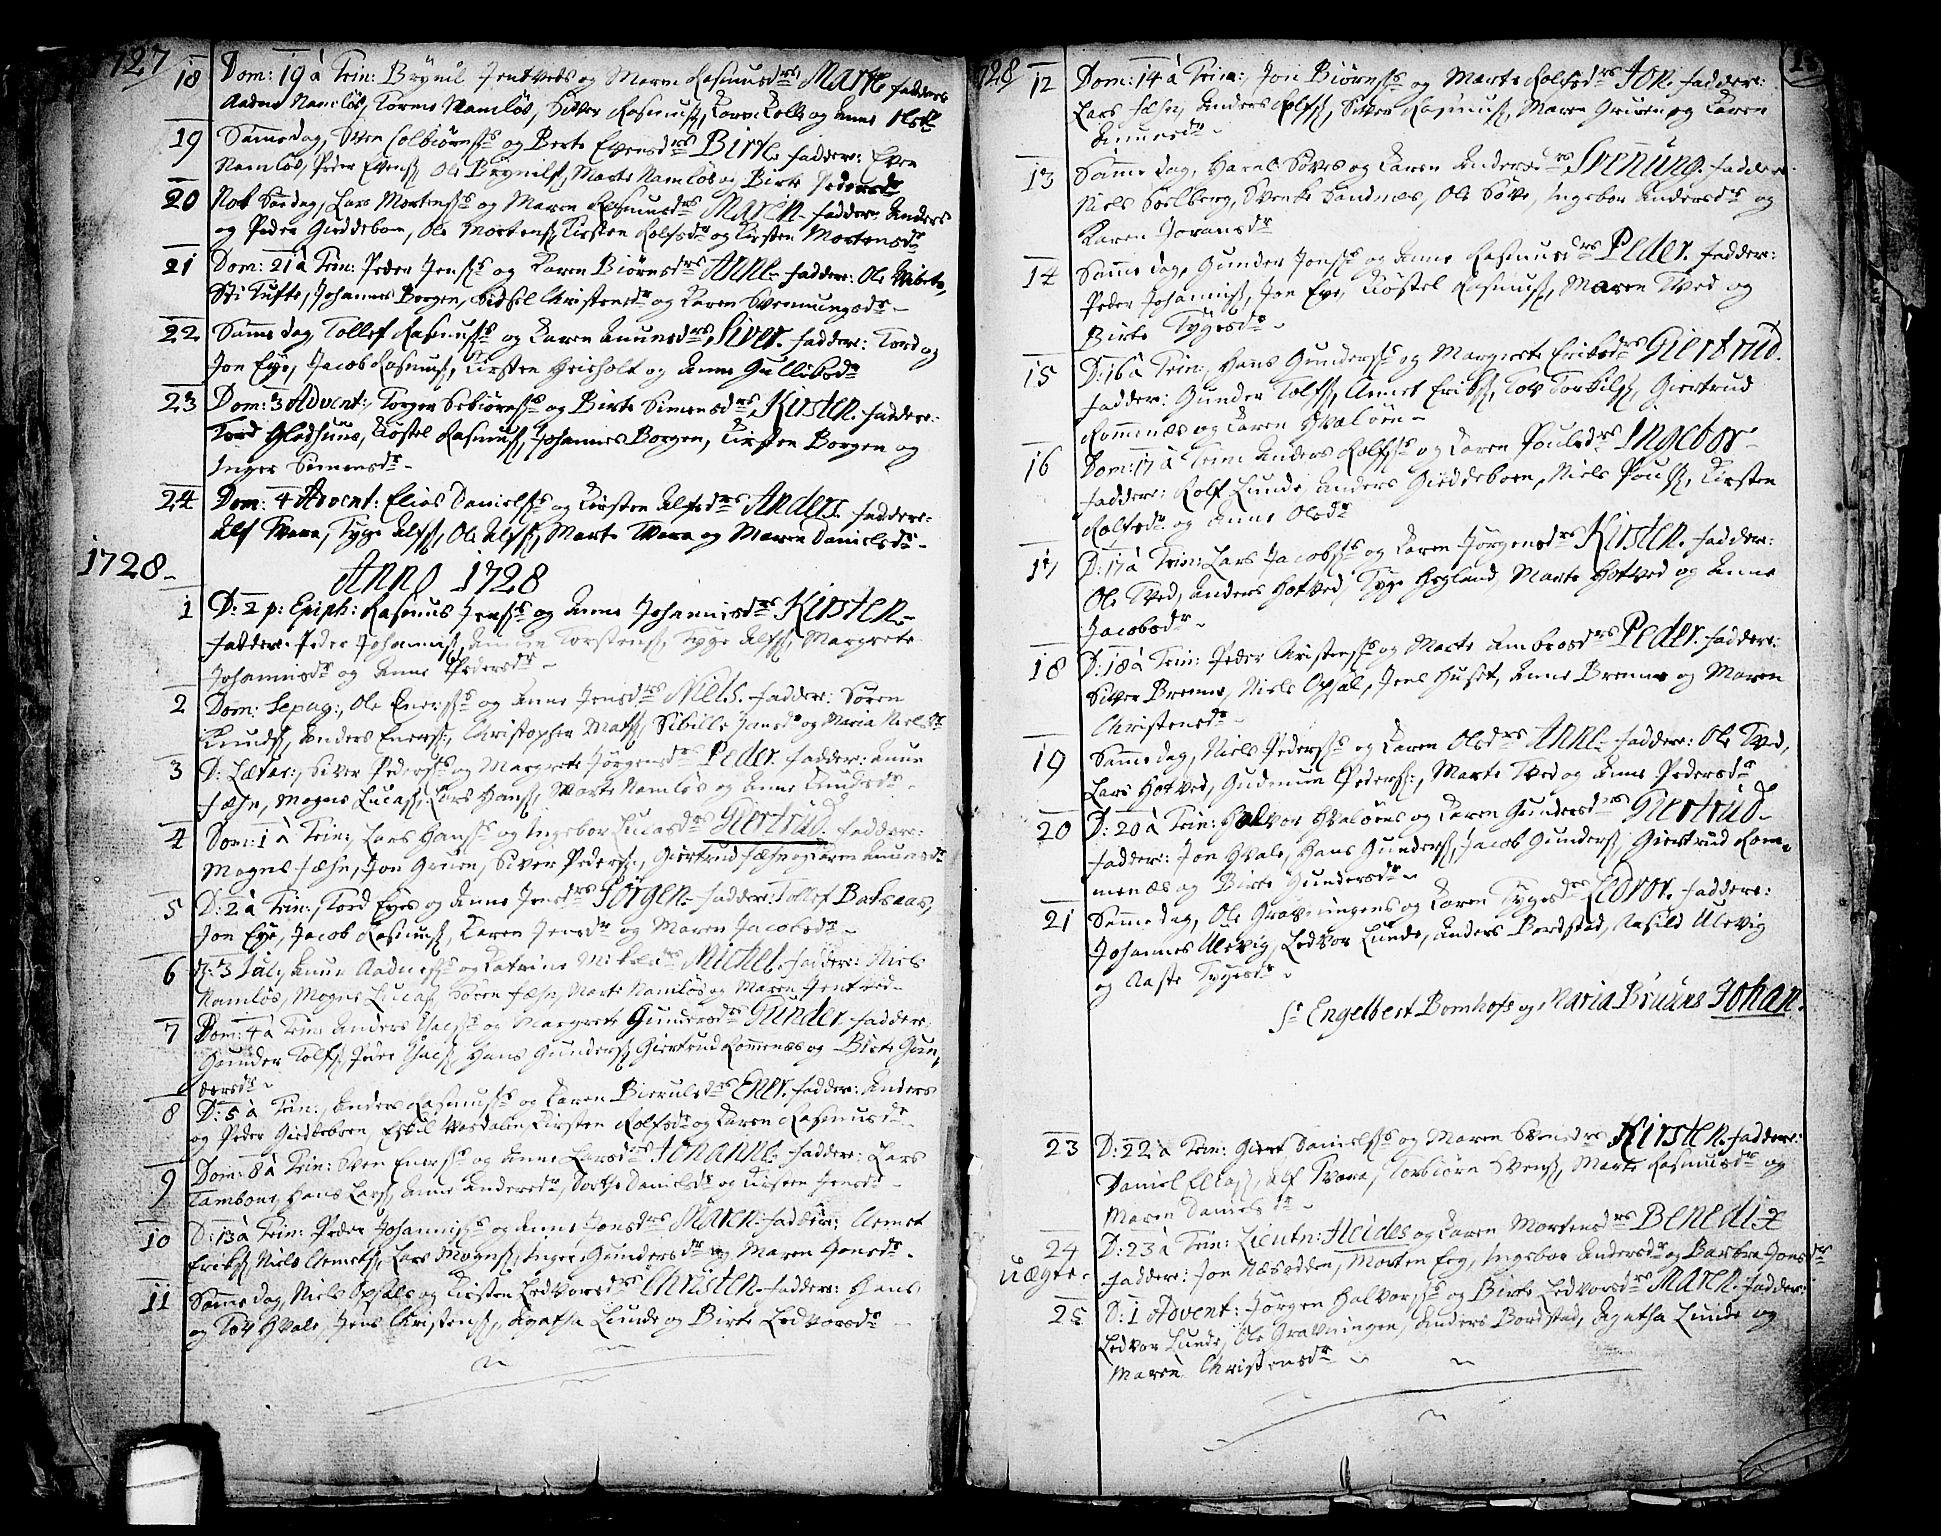 SAKO, Holla kirkebøker, F/Fa/L0001: Ministerialbok nr. 1, 1717-1779, s. 15